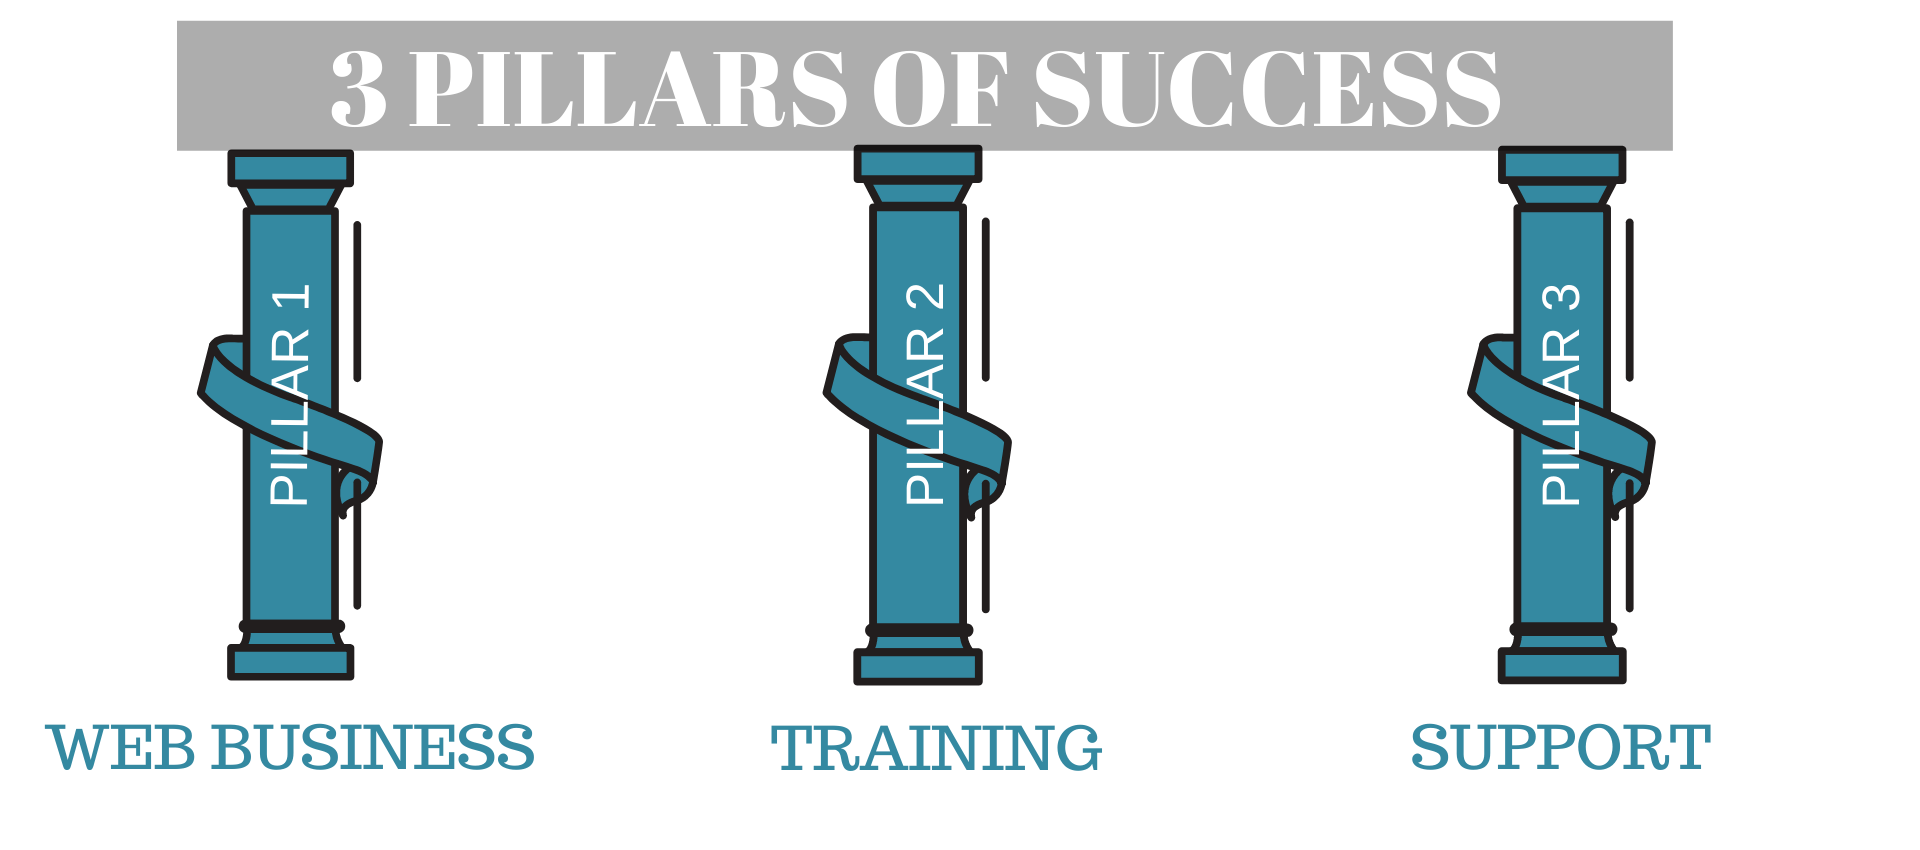 Pillars of success. Image of stone pillars